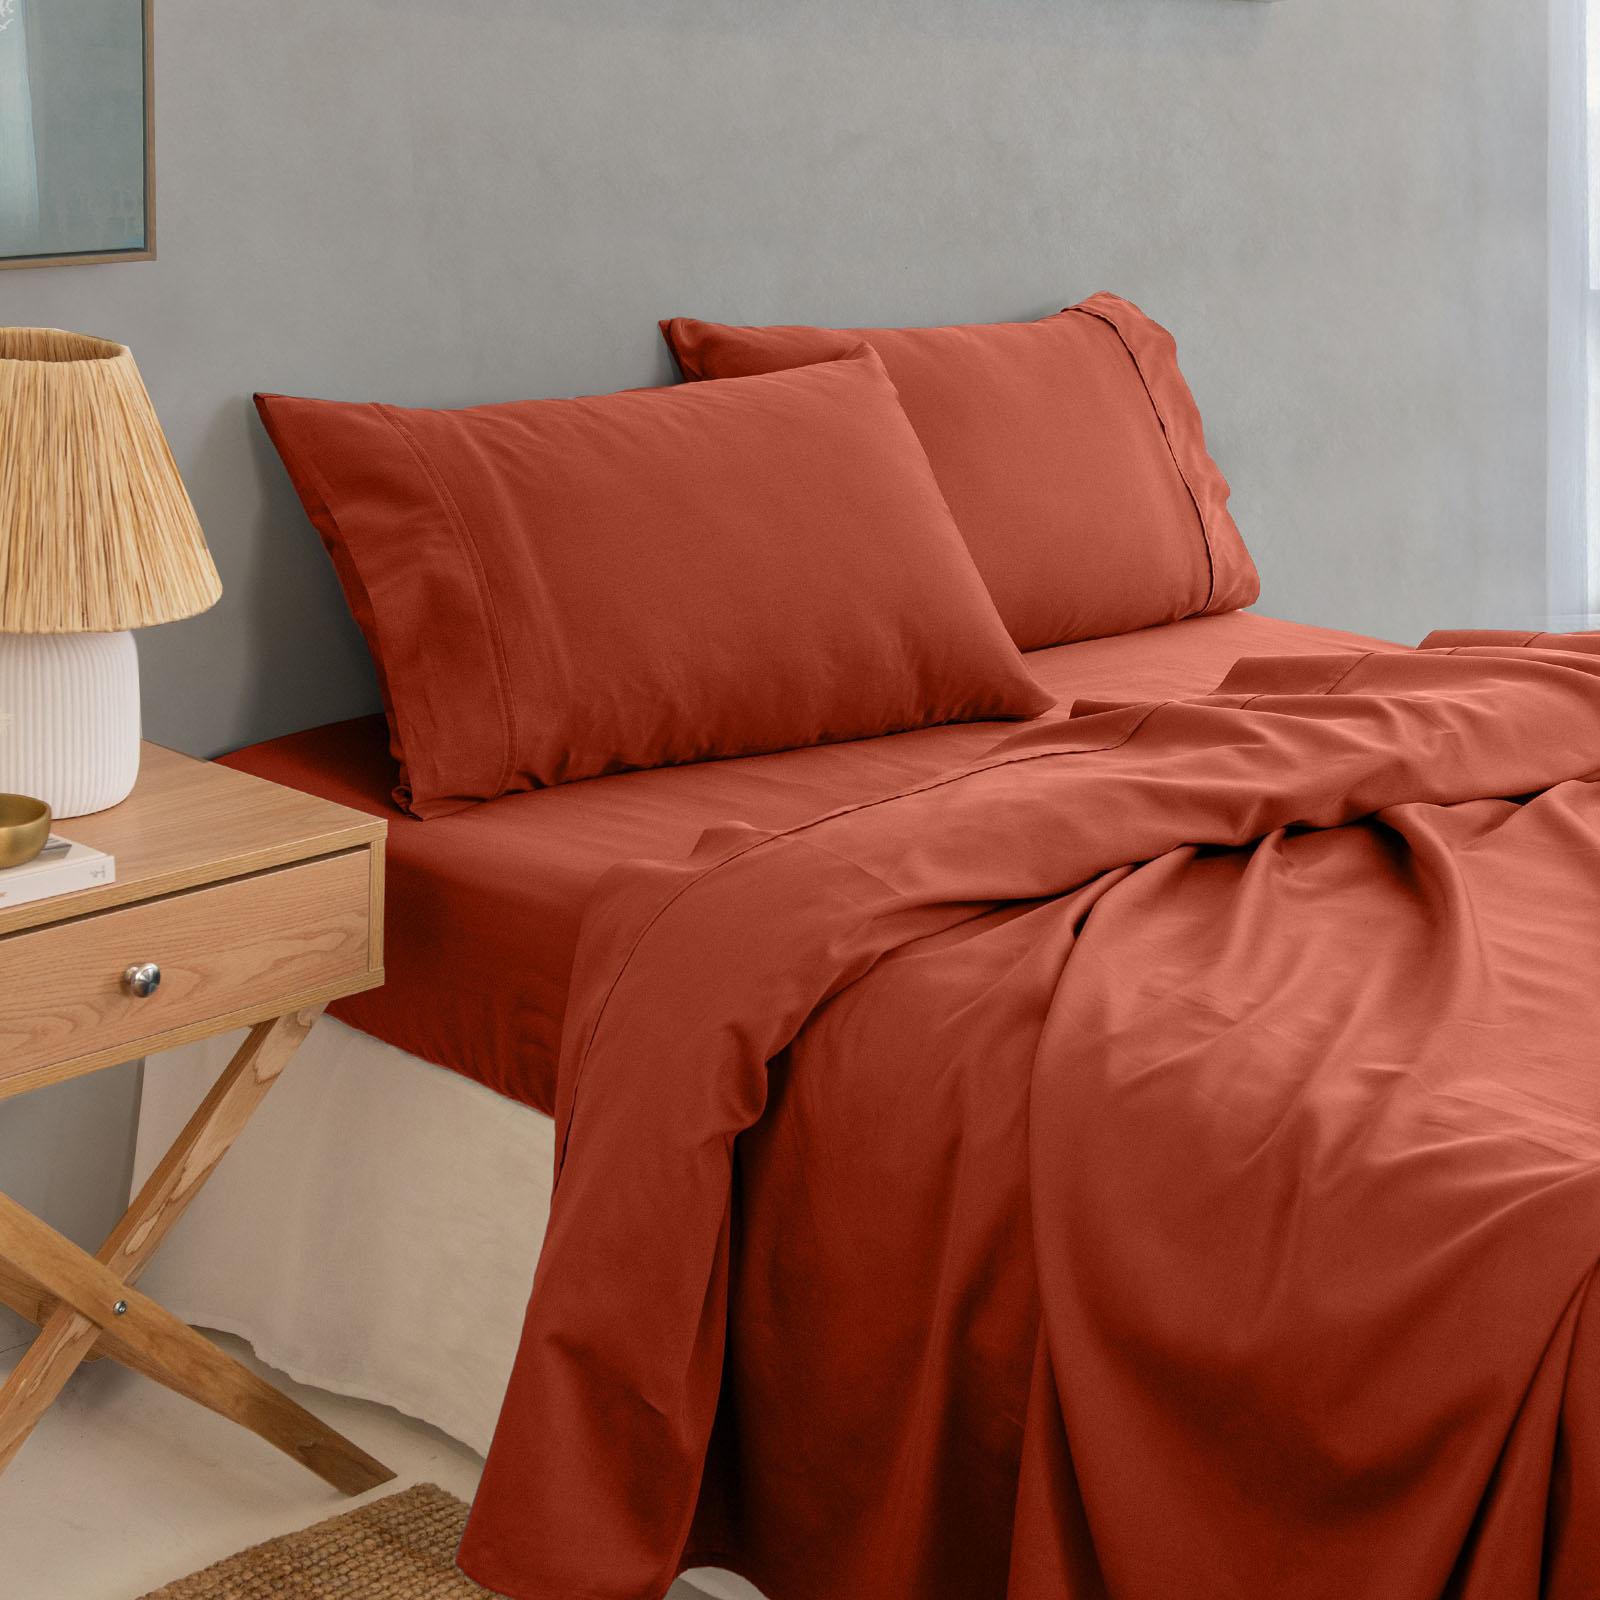 thumbnail 33 - Royal Comfort 1000TC Hotel Grade Bamboo Cotton Sheets Pillowcases Set Ultrasoft